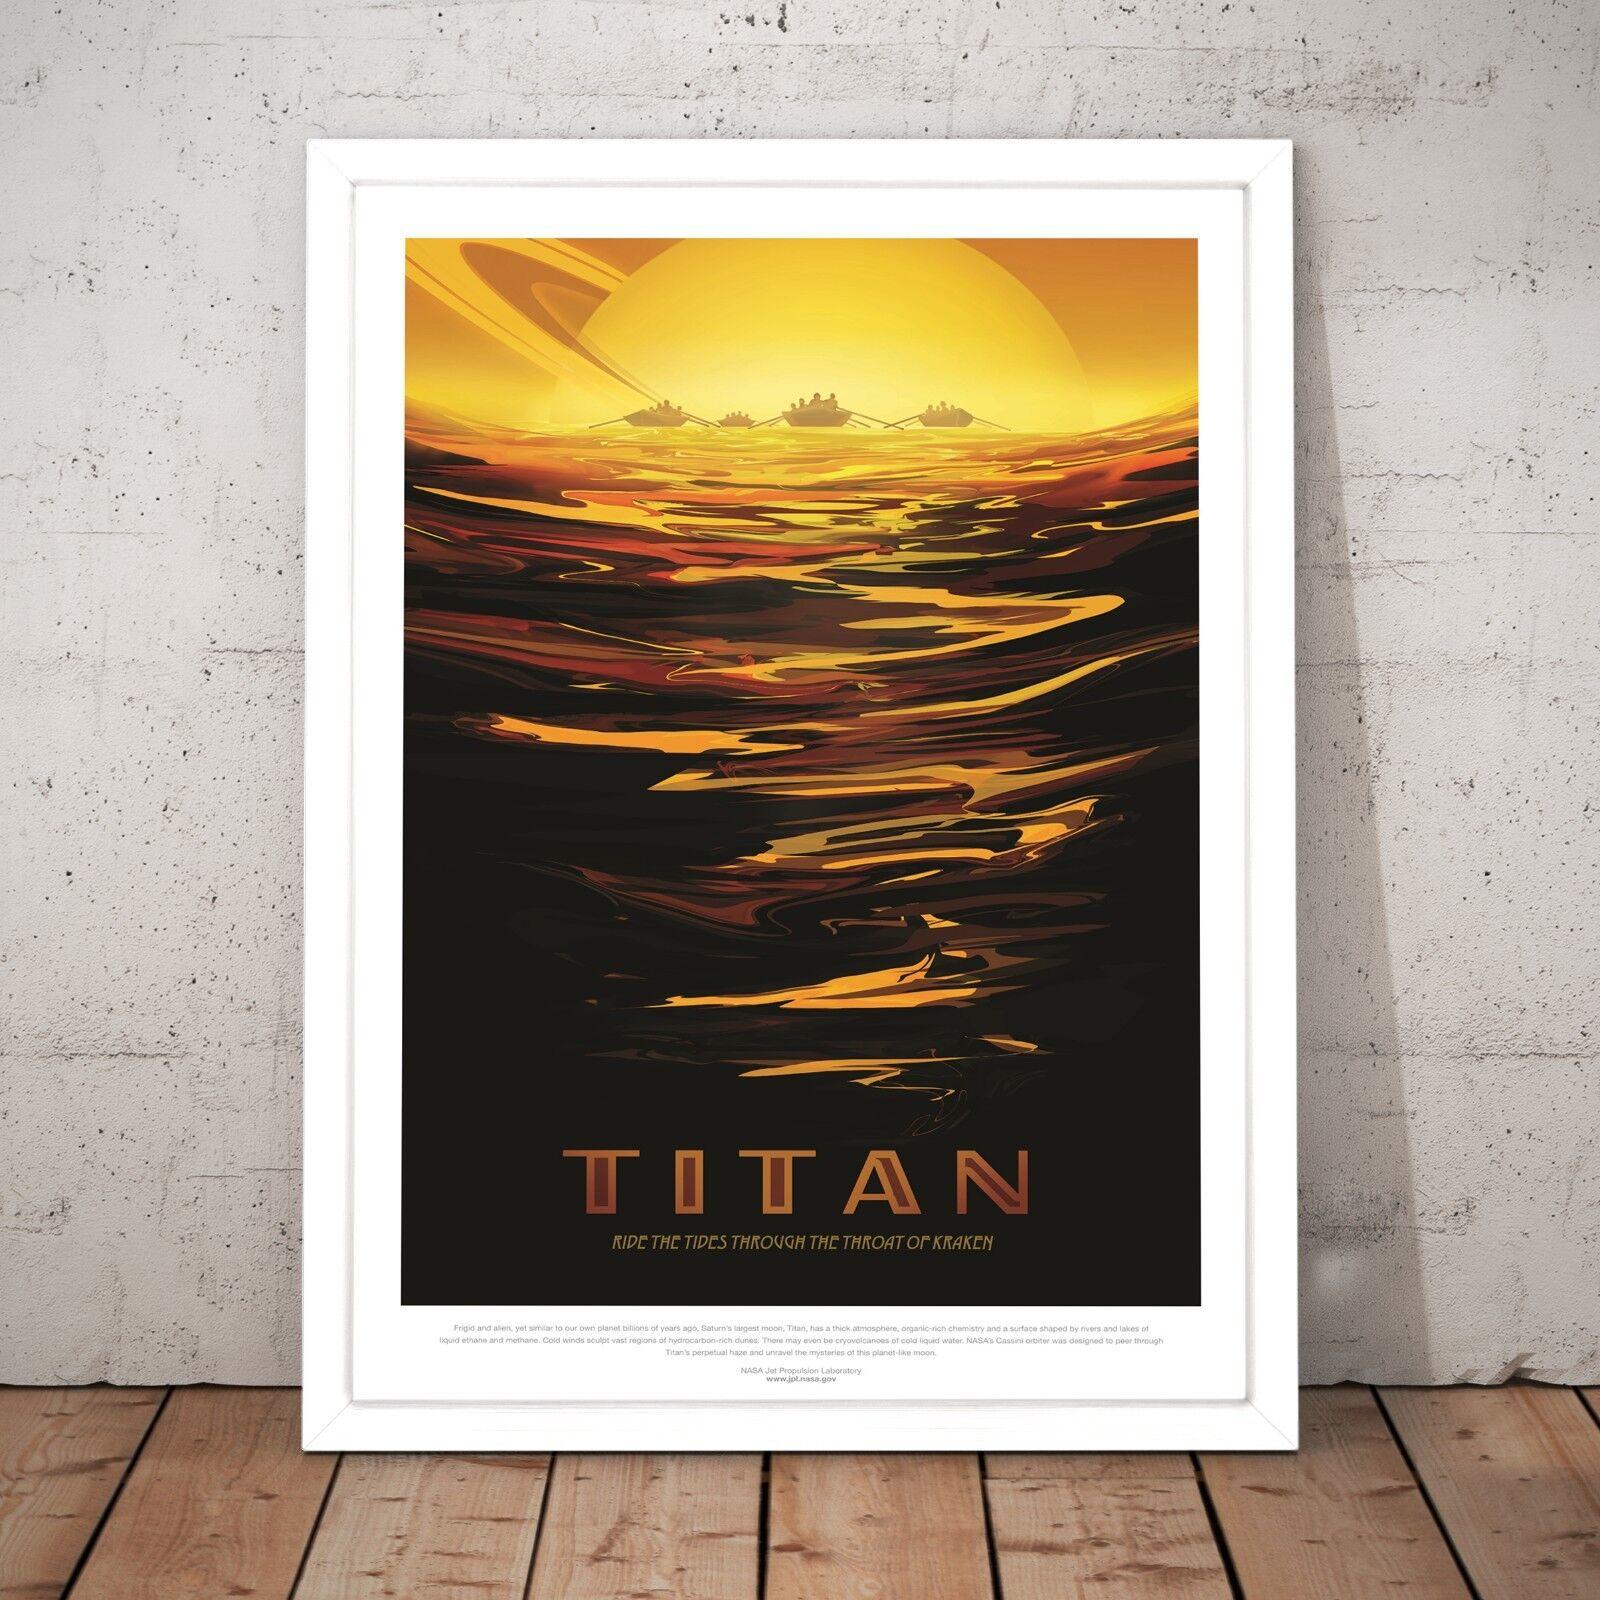 NASA Poster Titan Space Explorer Home Decor Wall Art Print - A3 A2 A1 A0 Framed